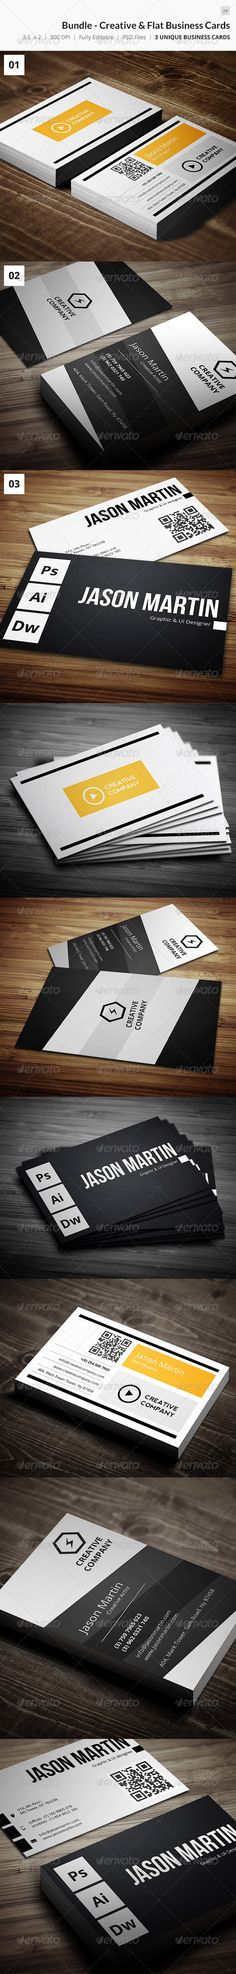 Bundle - Creative & Flat Business Cards - 24